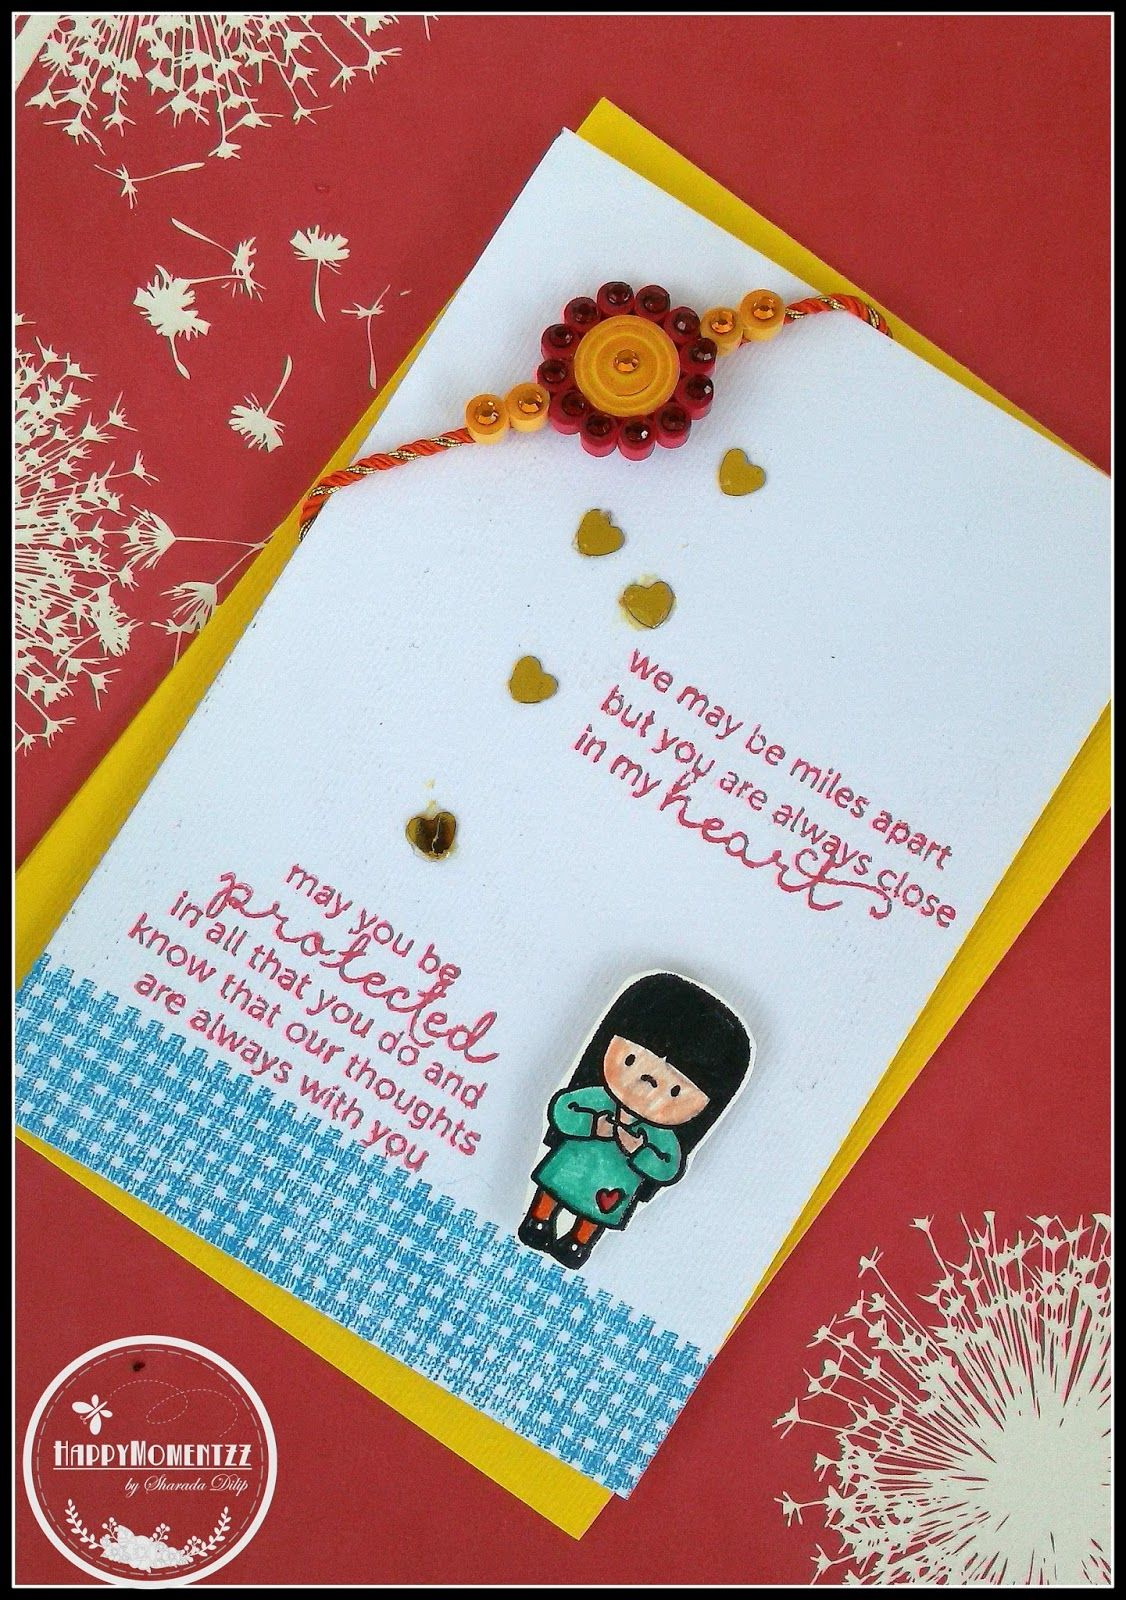 Pinshikha Chamaria On Rakhi Cards   Rakhi Cards, Handmade Rakhi - Free Online Printable Rakhi Cards